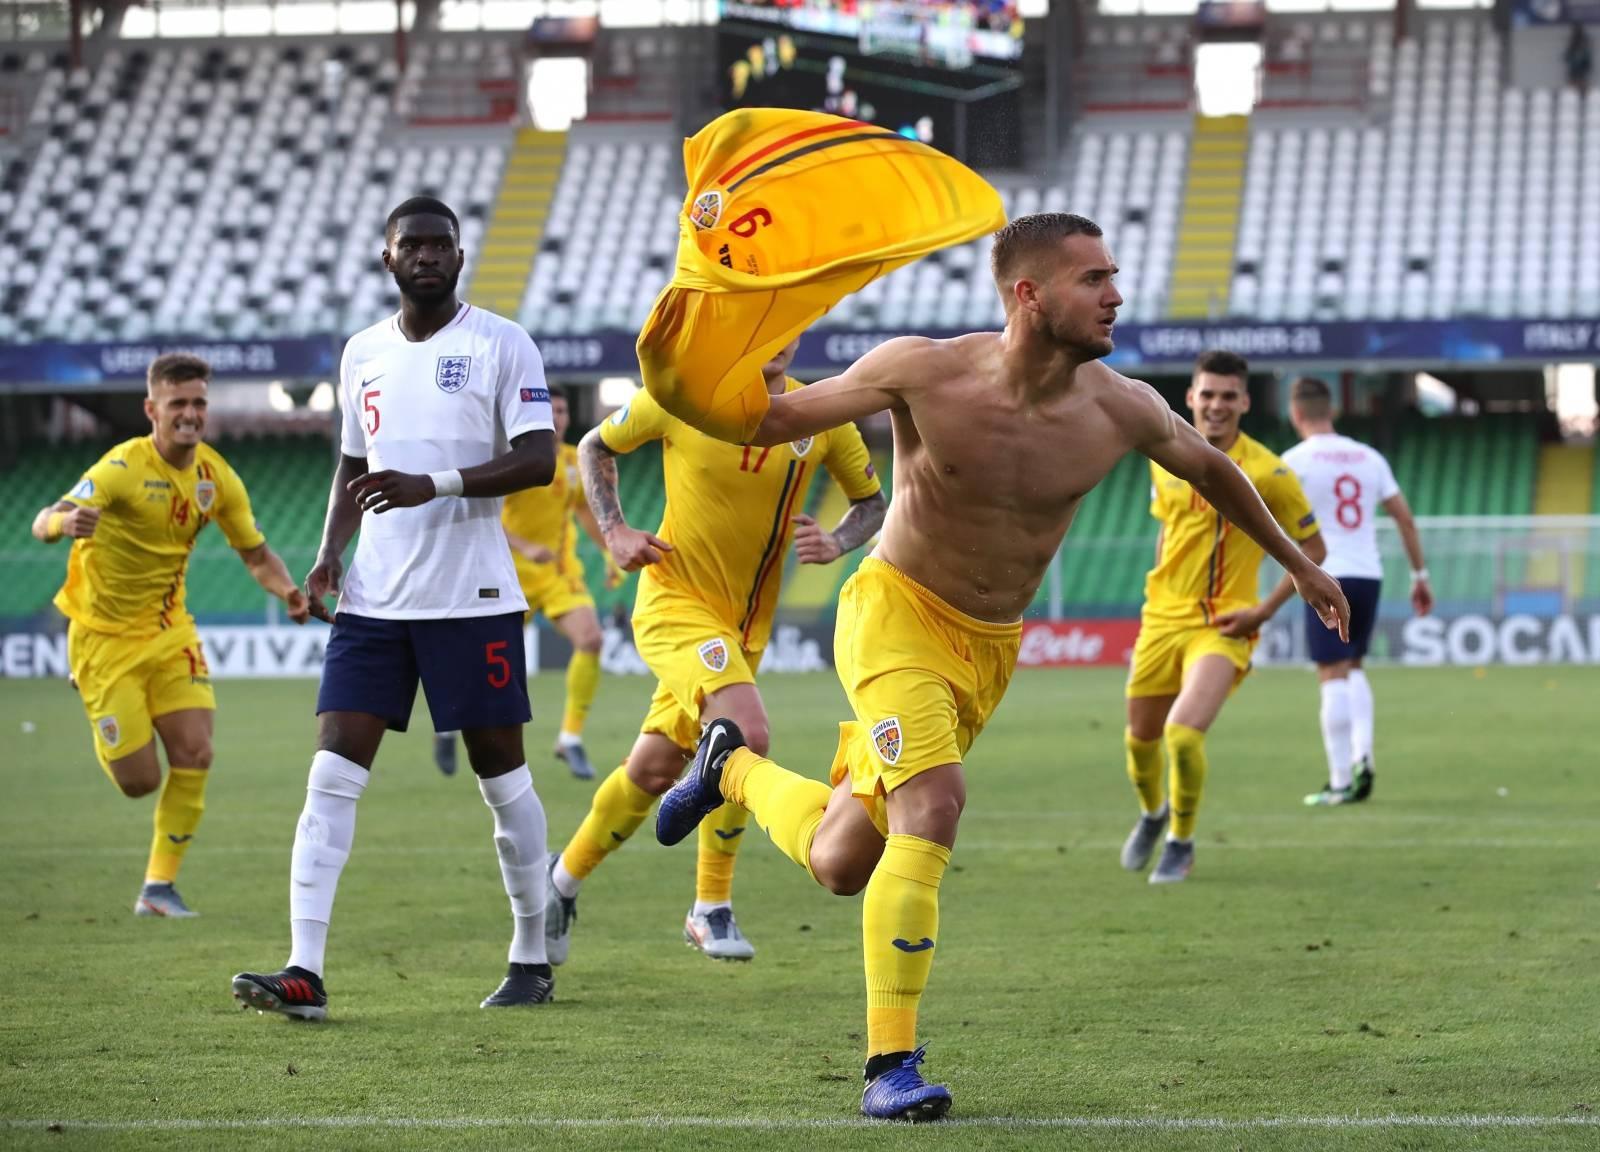 England U21 v Romania U21 - UEFA European Under-21 Championship - Group C - San Marino Stadium